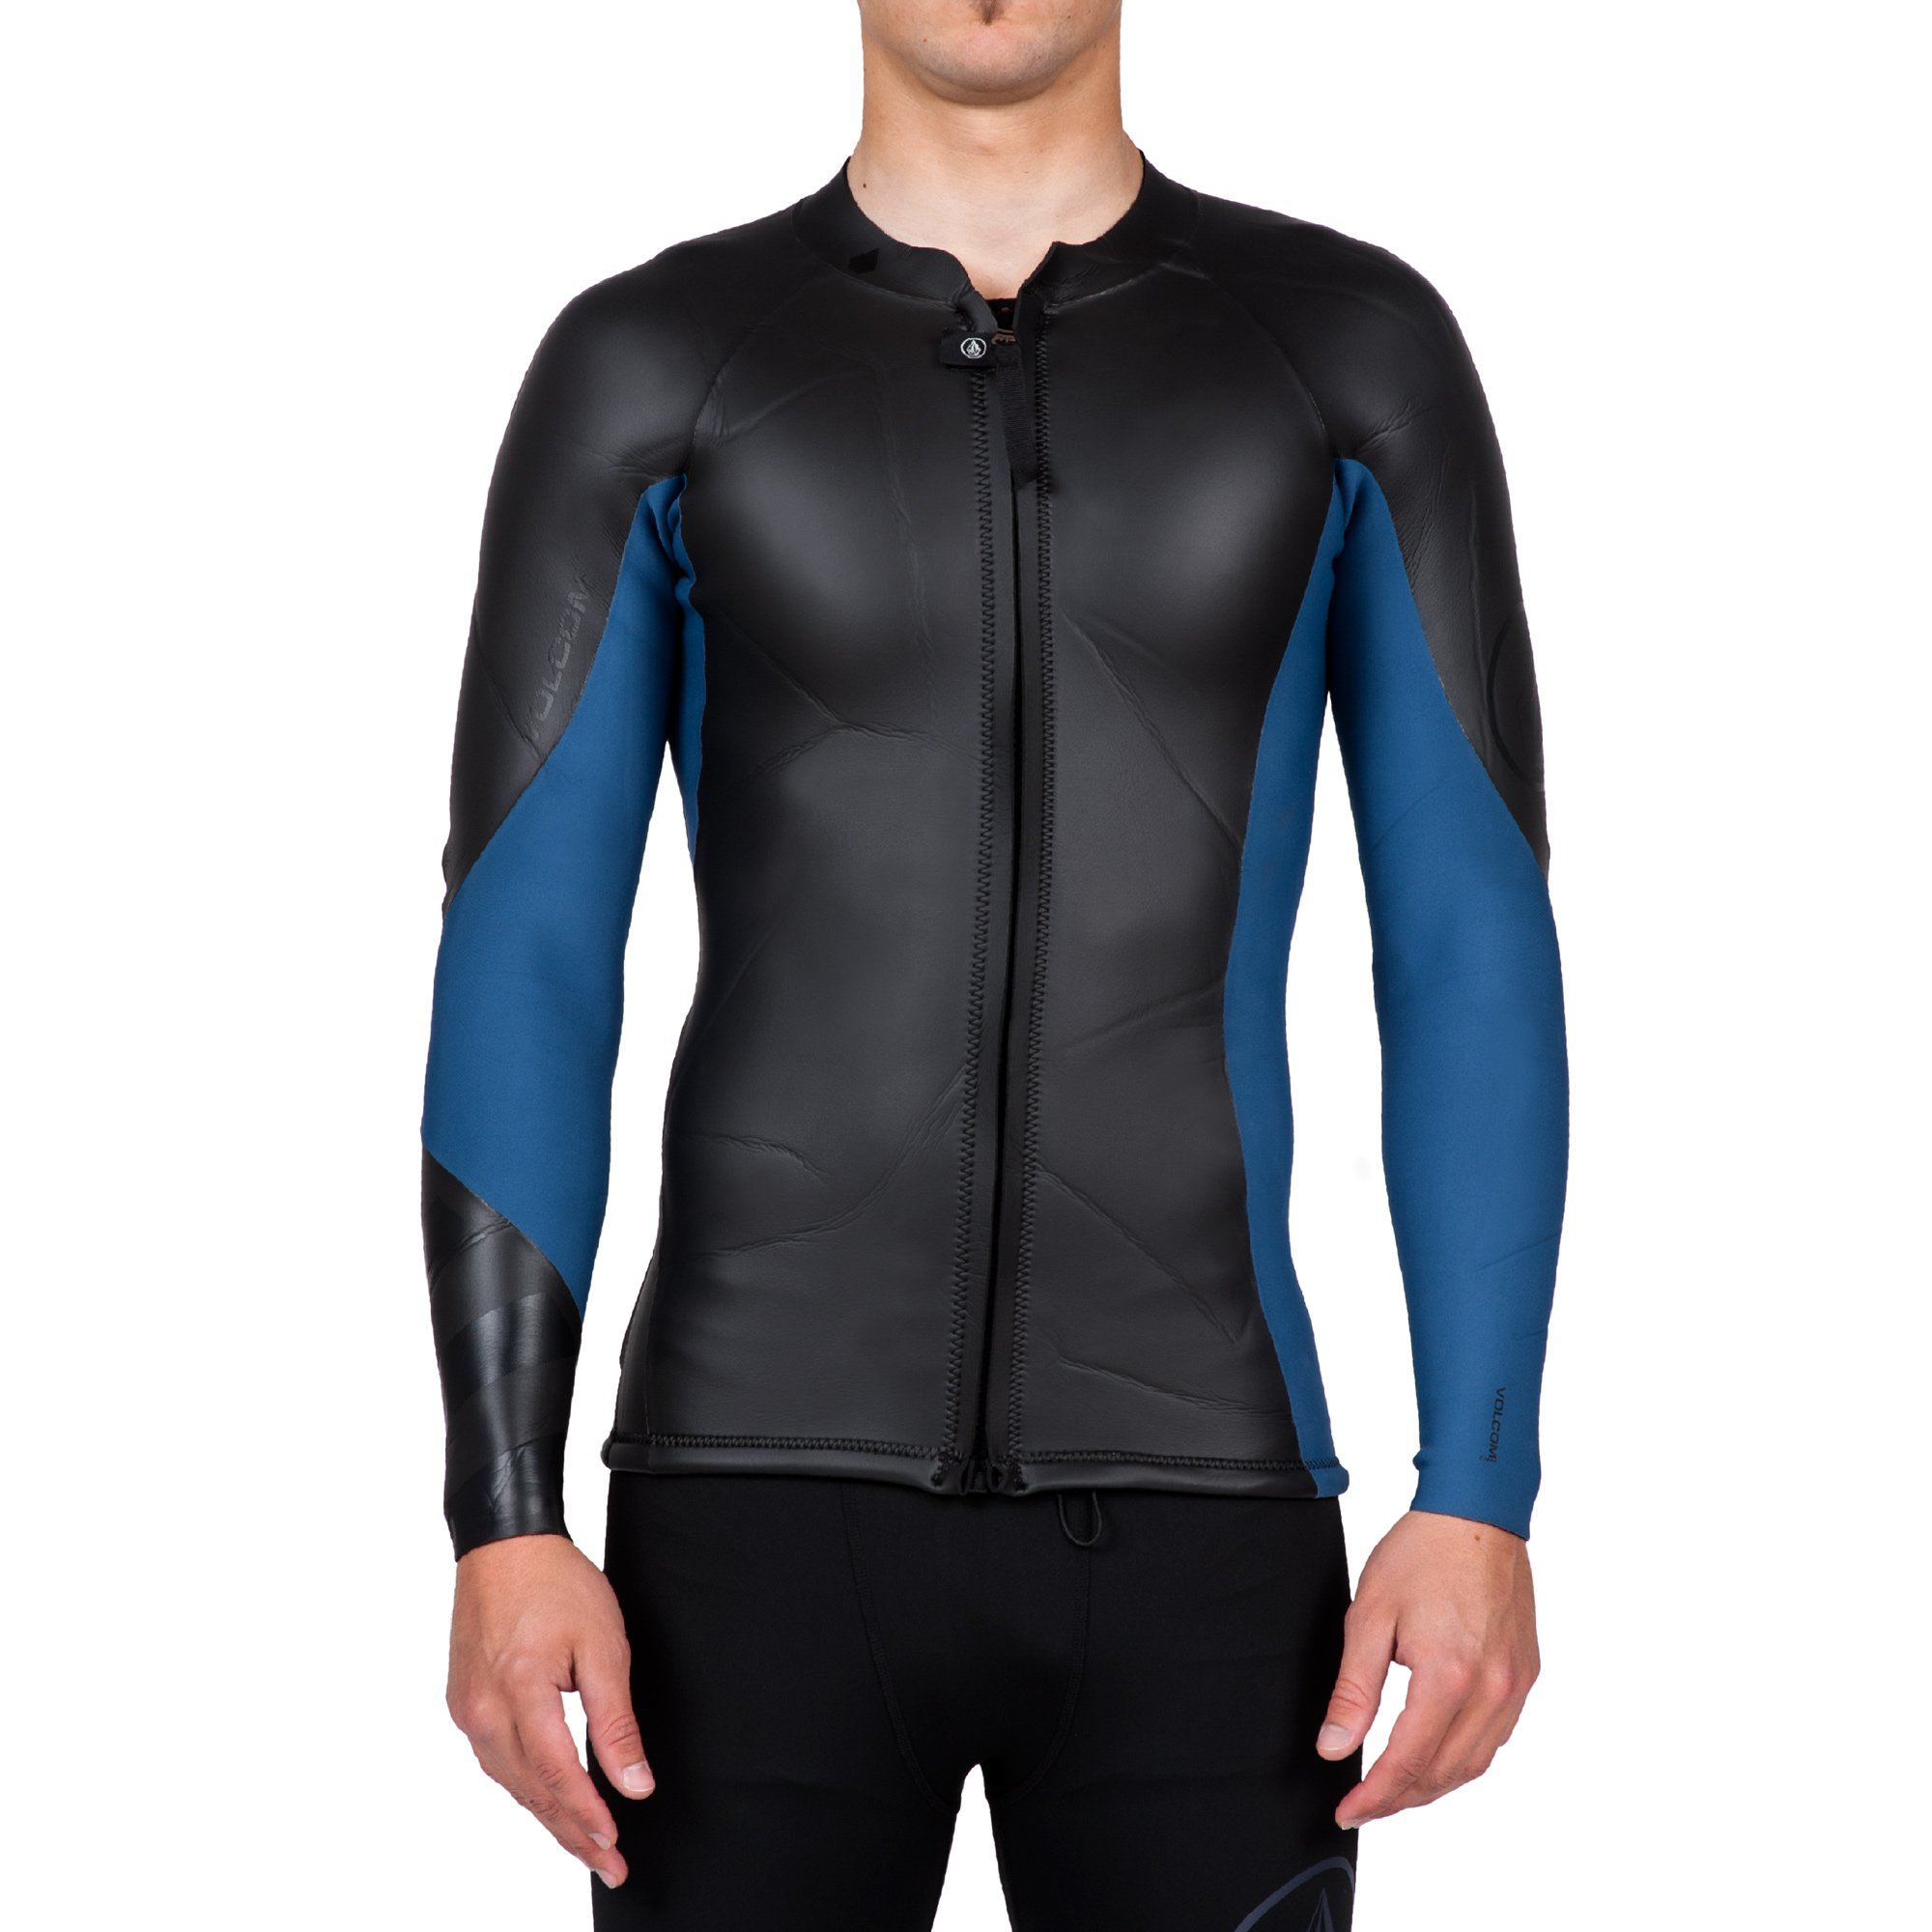 Volcom Men's Lefty Front Zip Jacket, Black, Medium